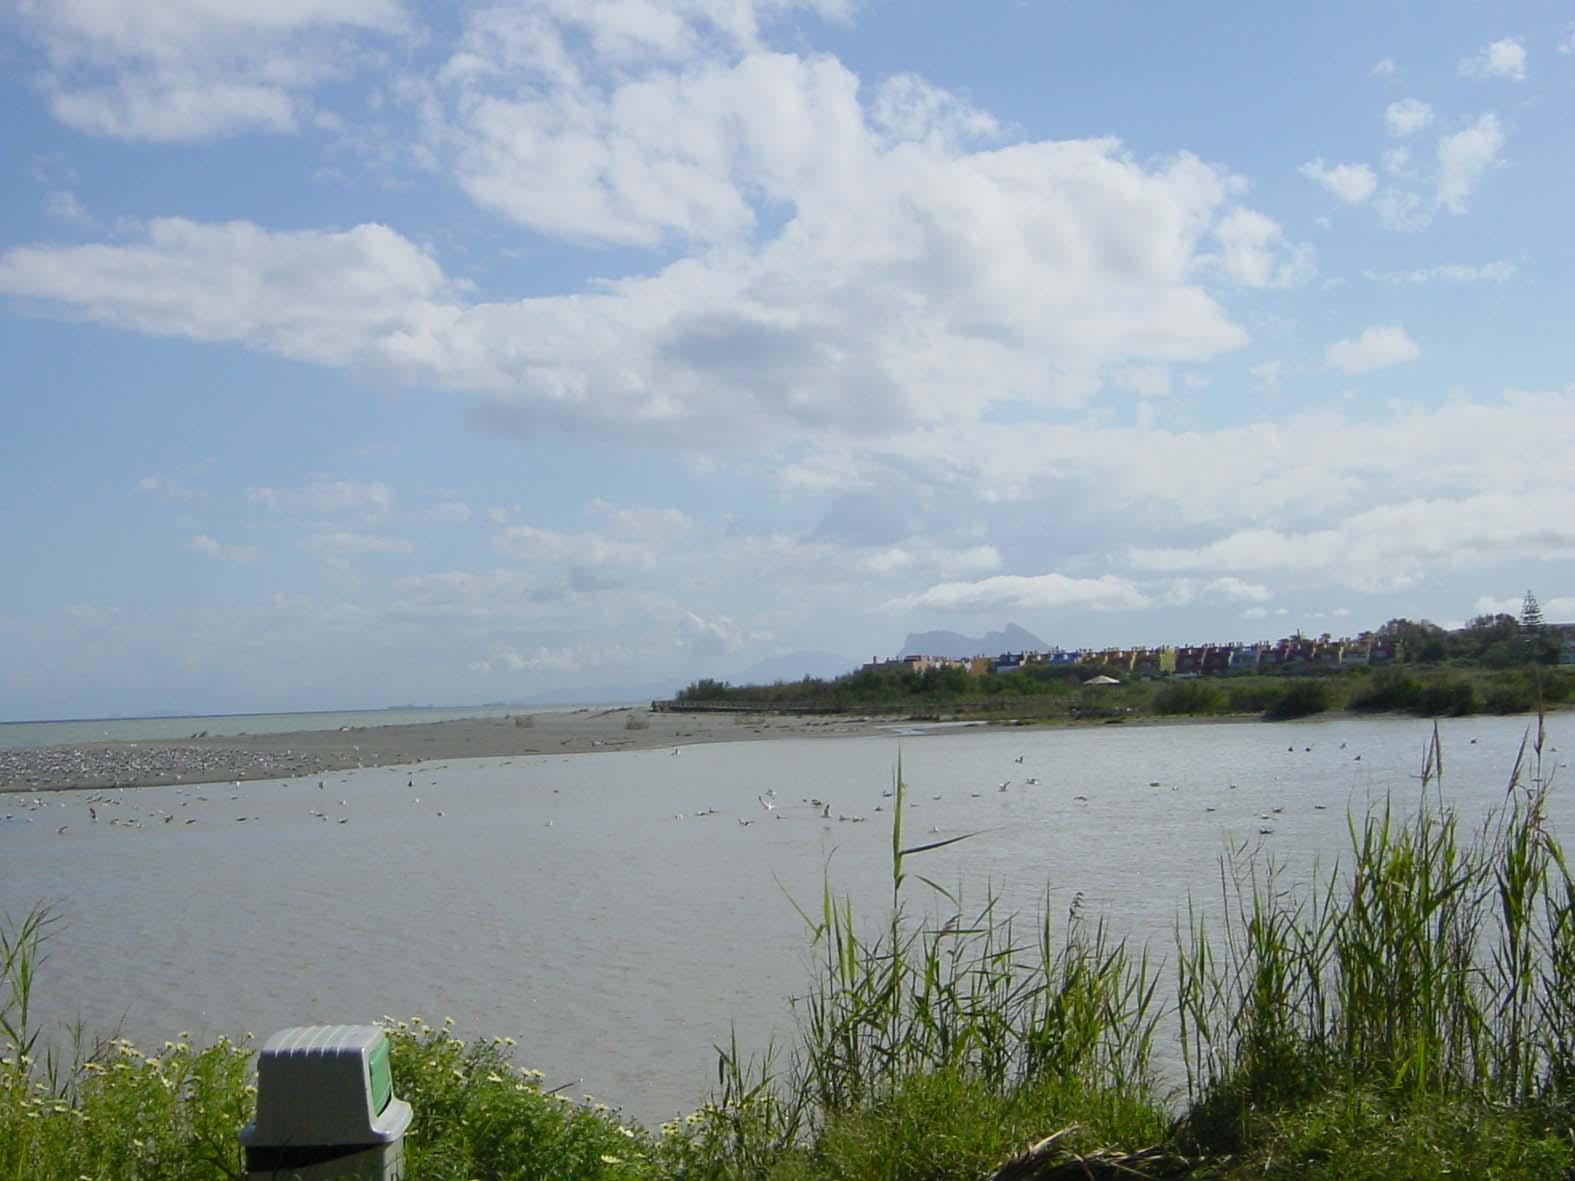 Guadiaro River Estuary & Torreguadiaro - 126.6KB